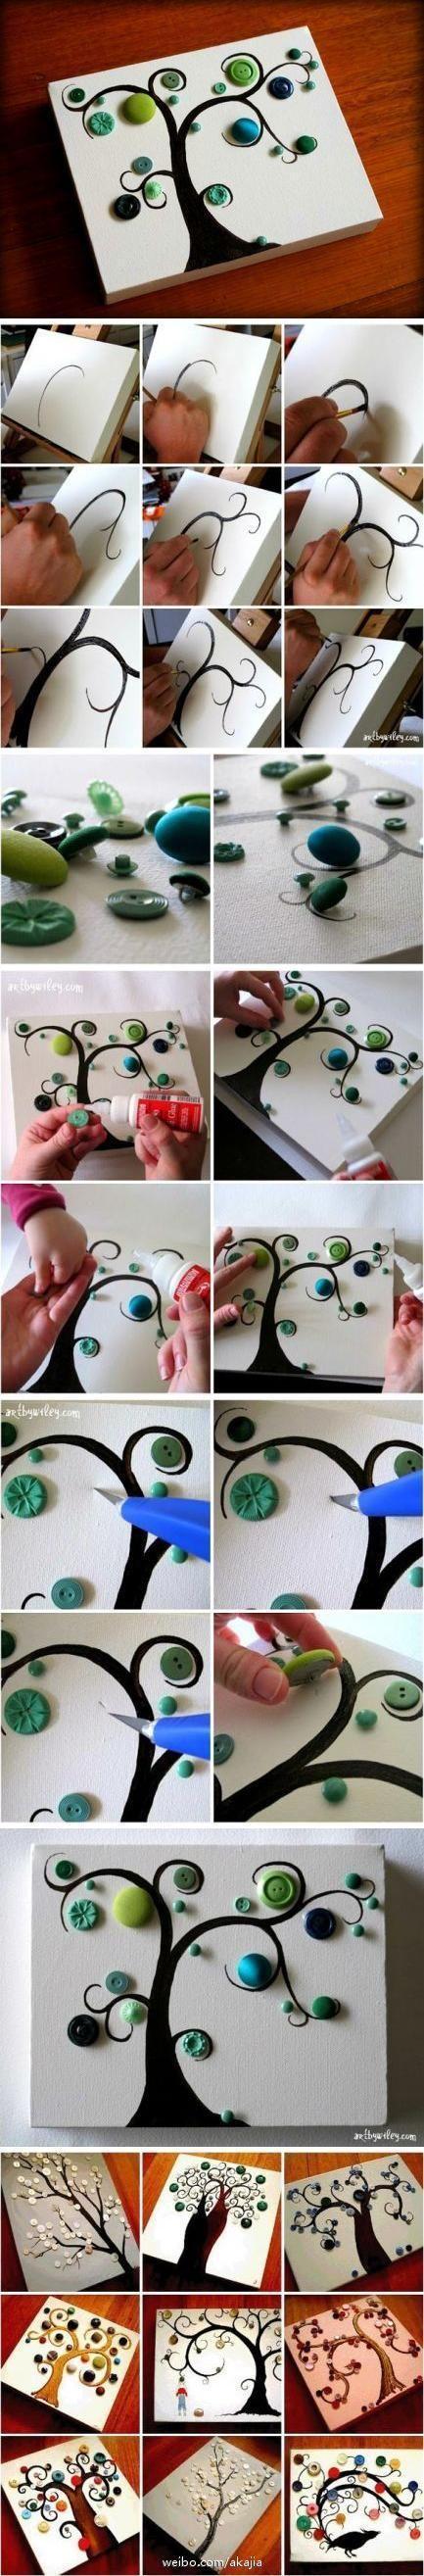 Handmade botones